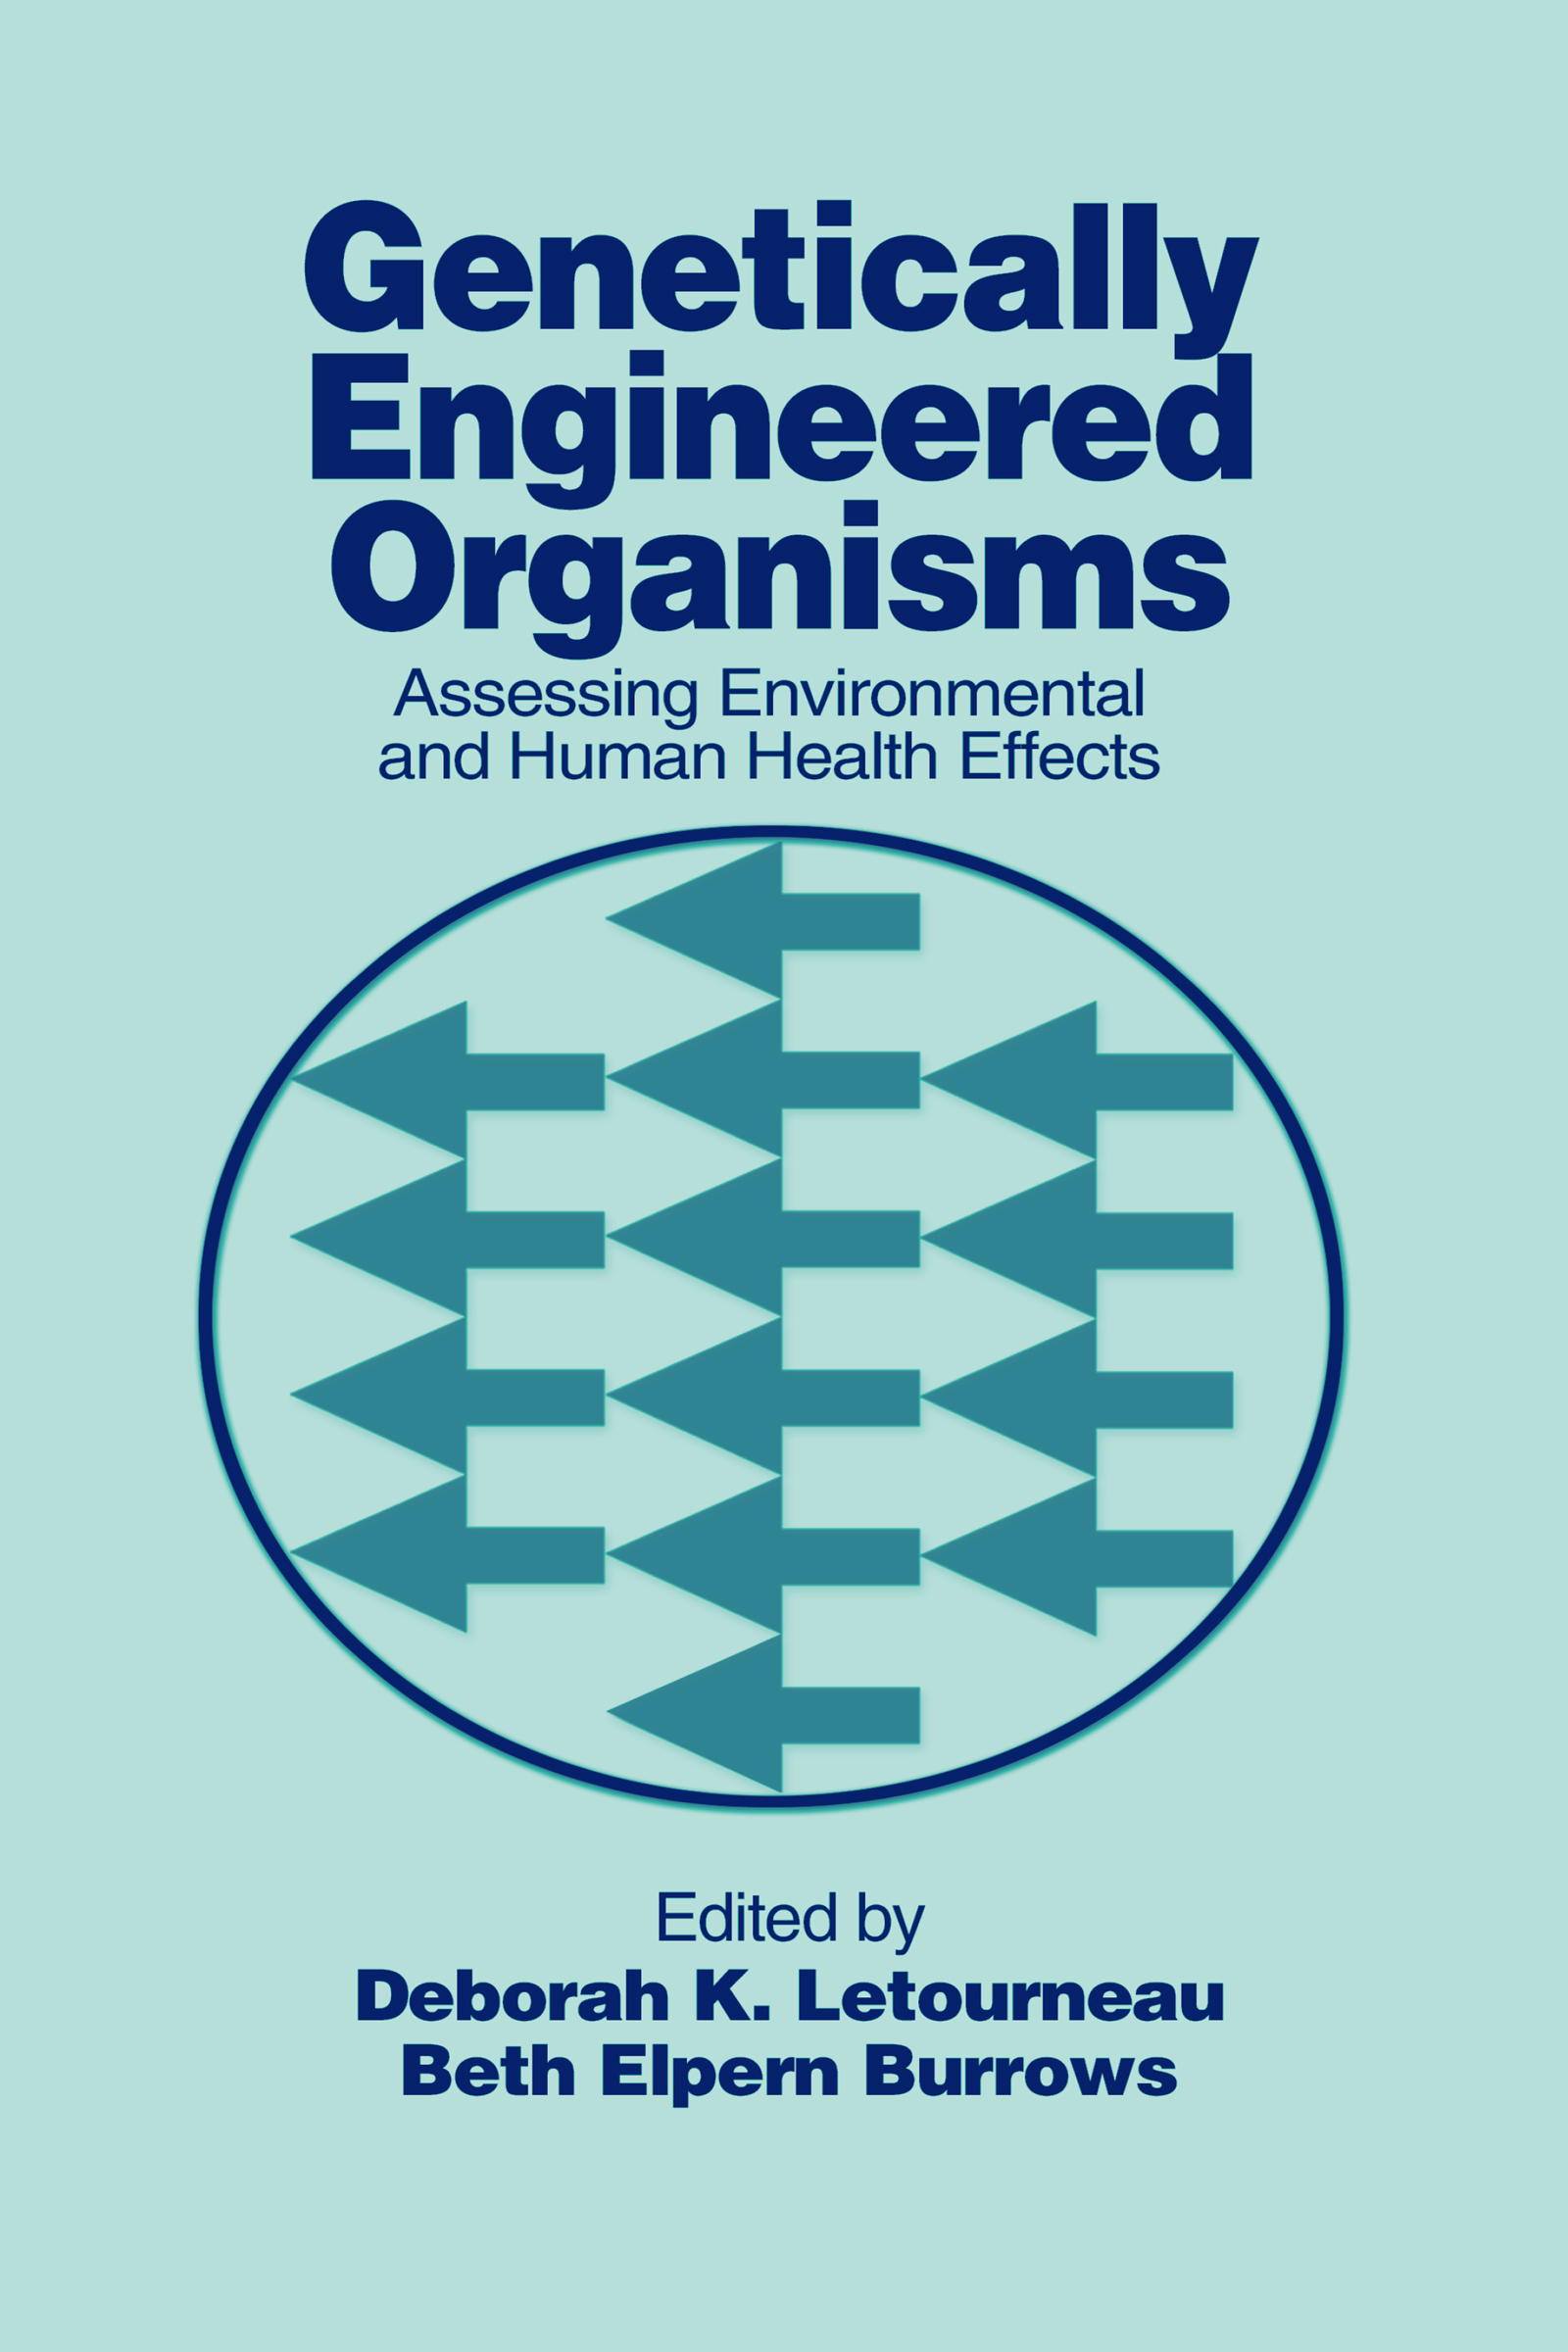 Genetically Engineered Organisms